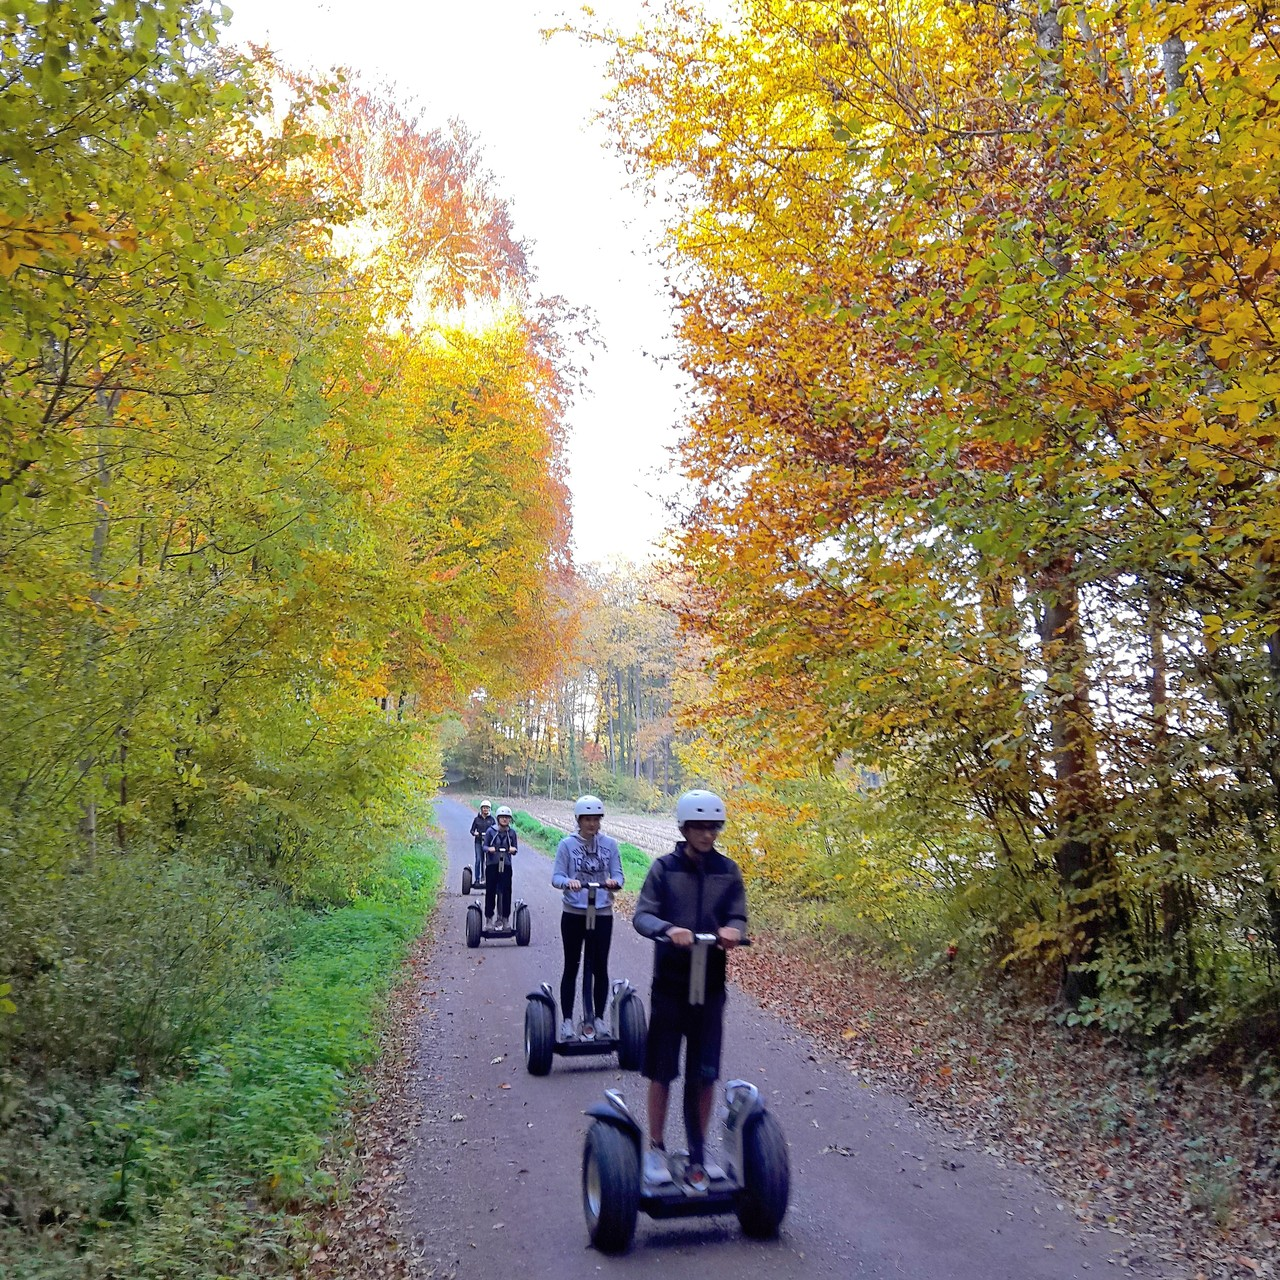 FUN MOVING GYROPODE SEGWAY EN ALSACE - Sundgau